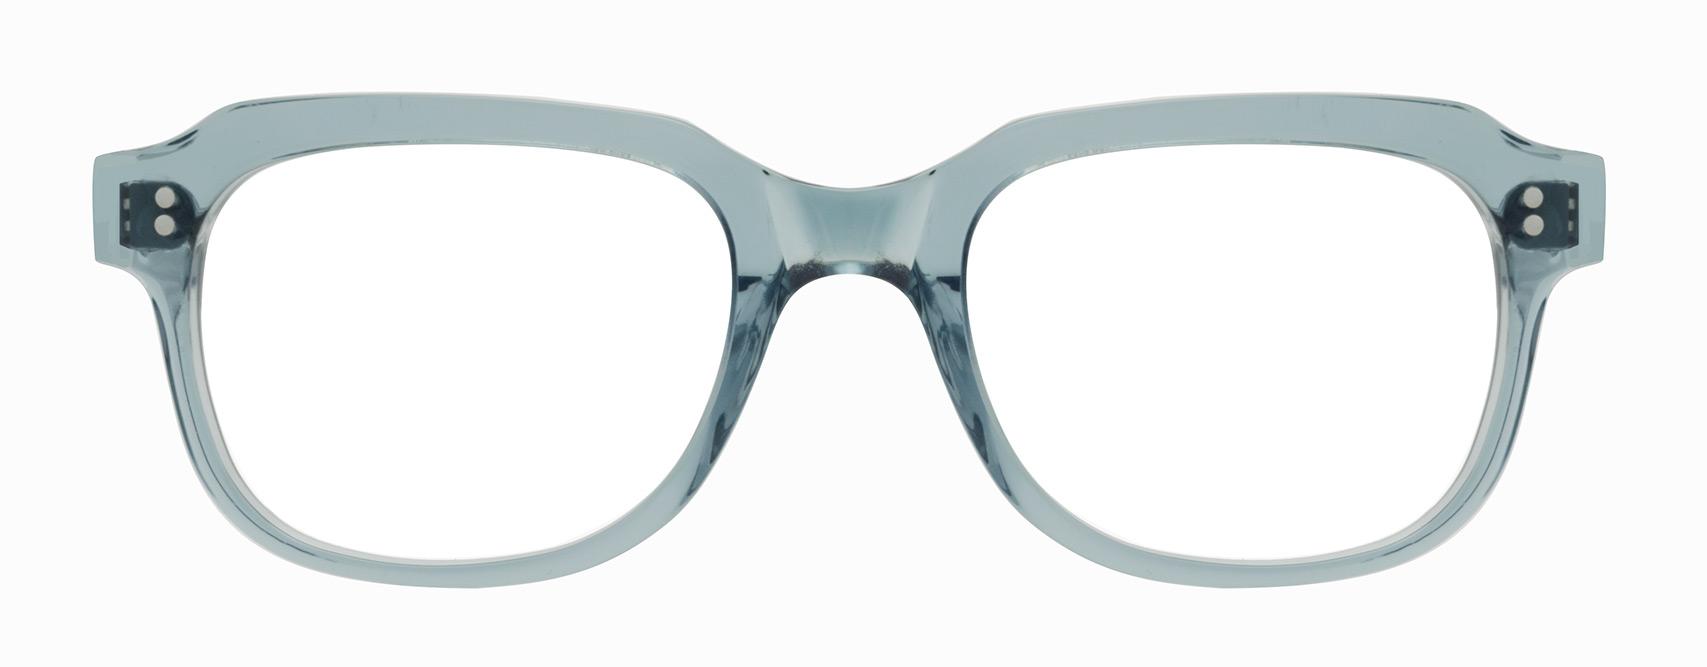 moscot-eyewear-ss2013-18